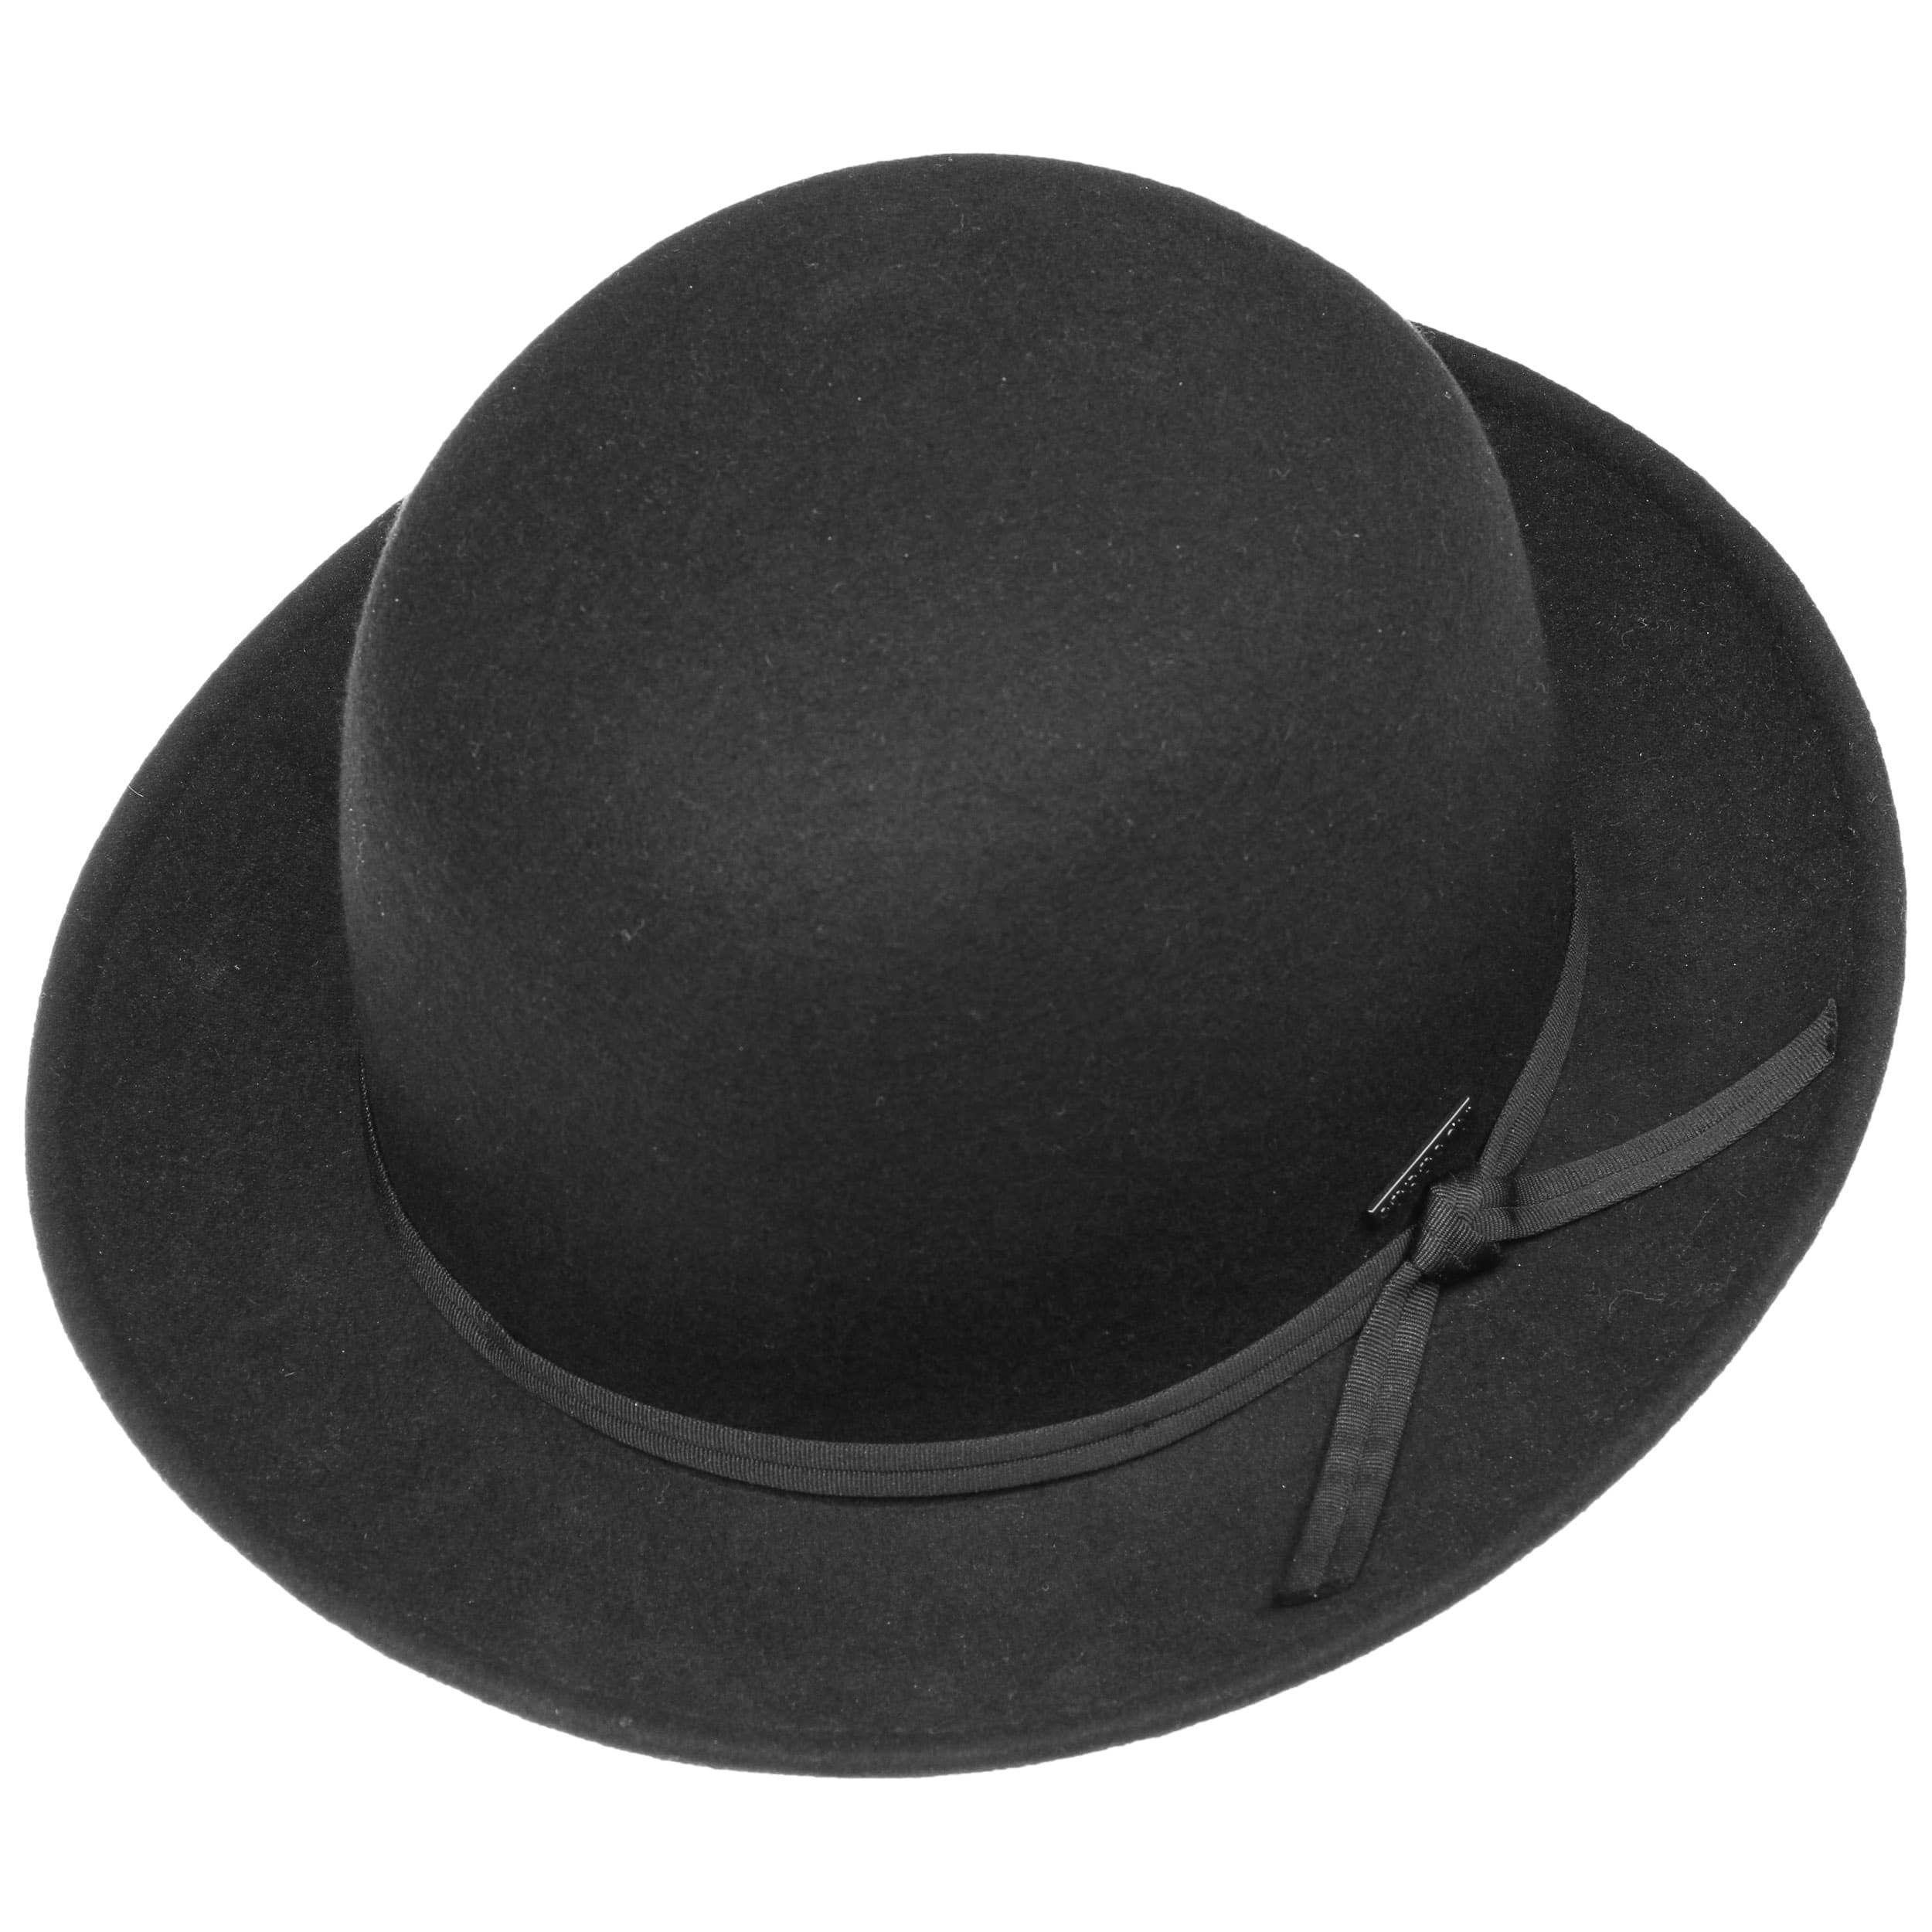 Tilbury Bowler Filzmelone schwarz